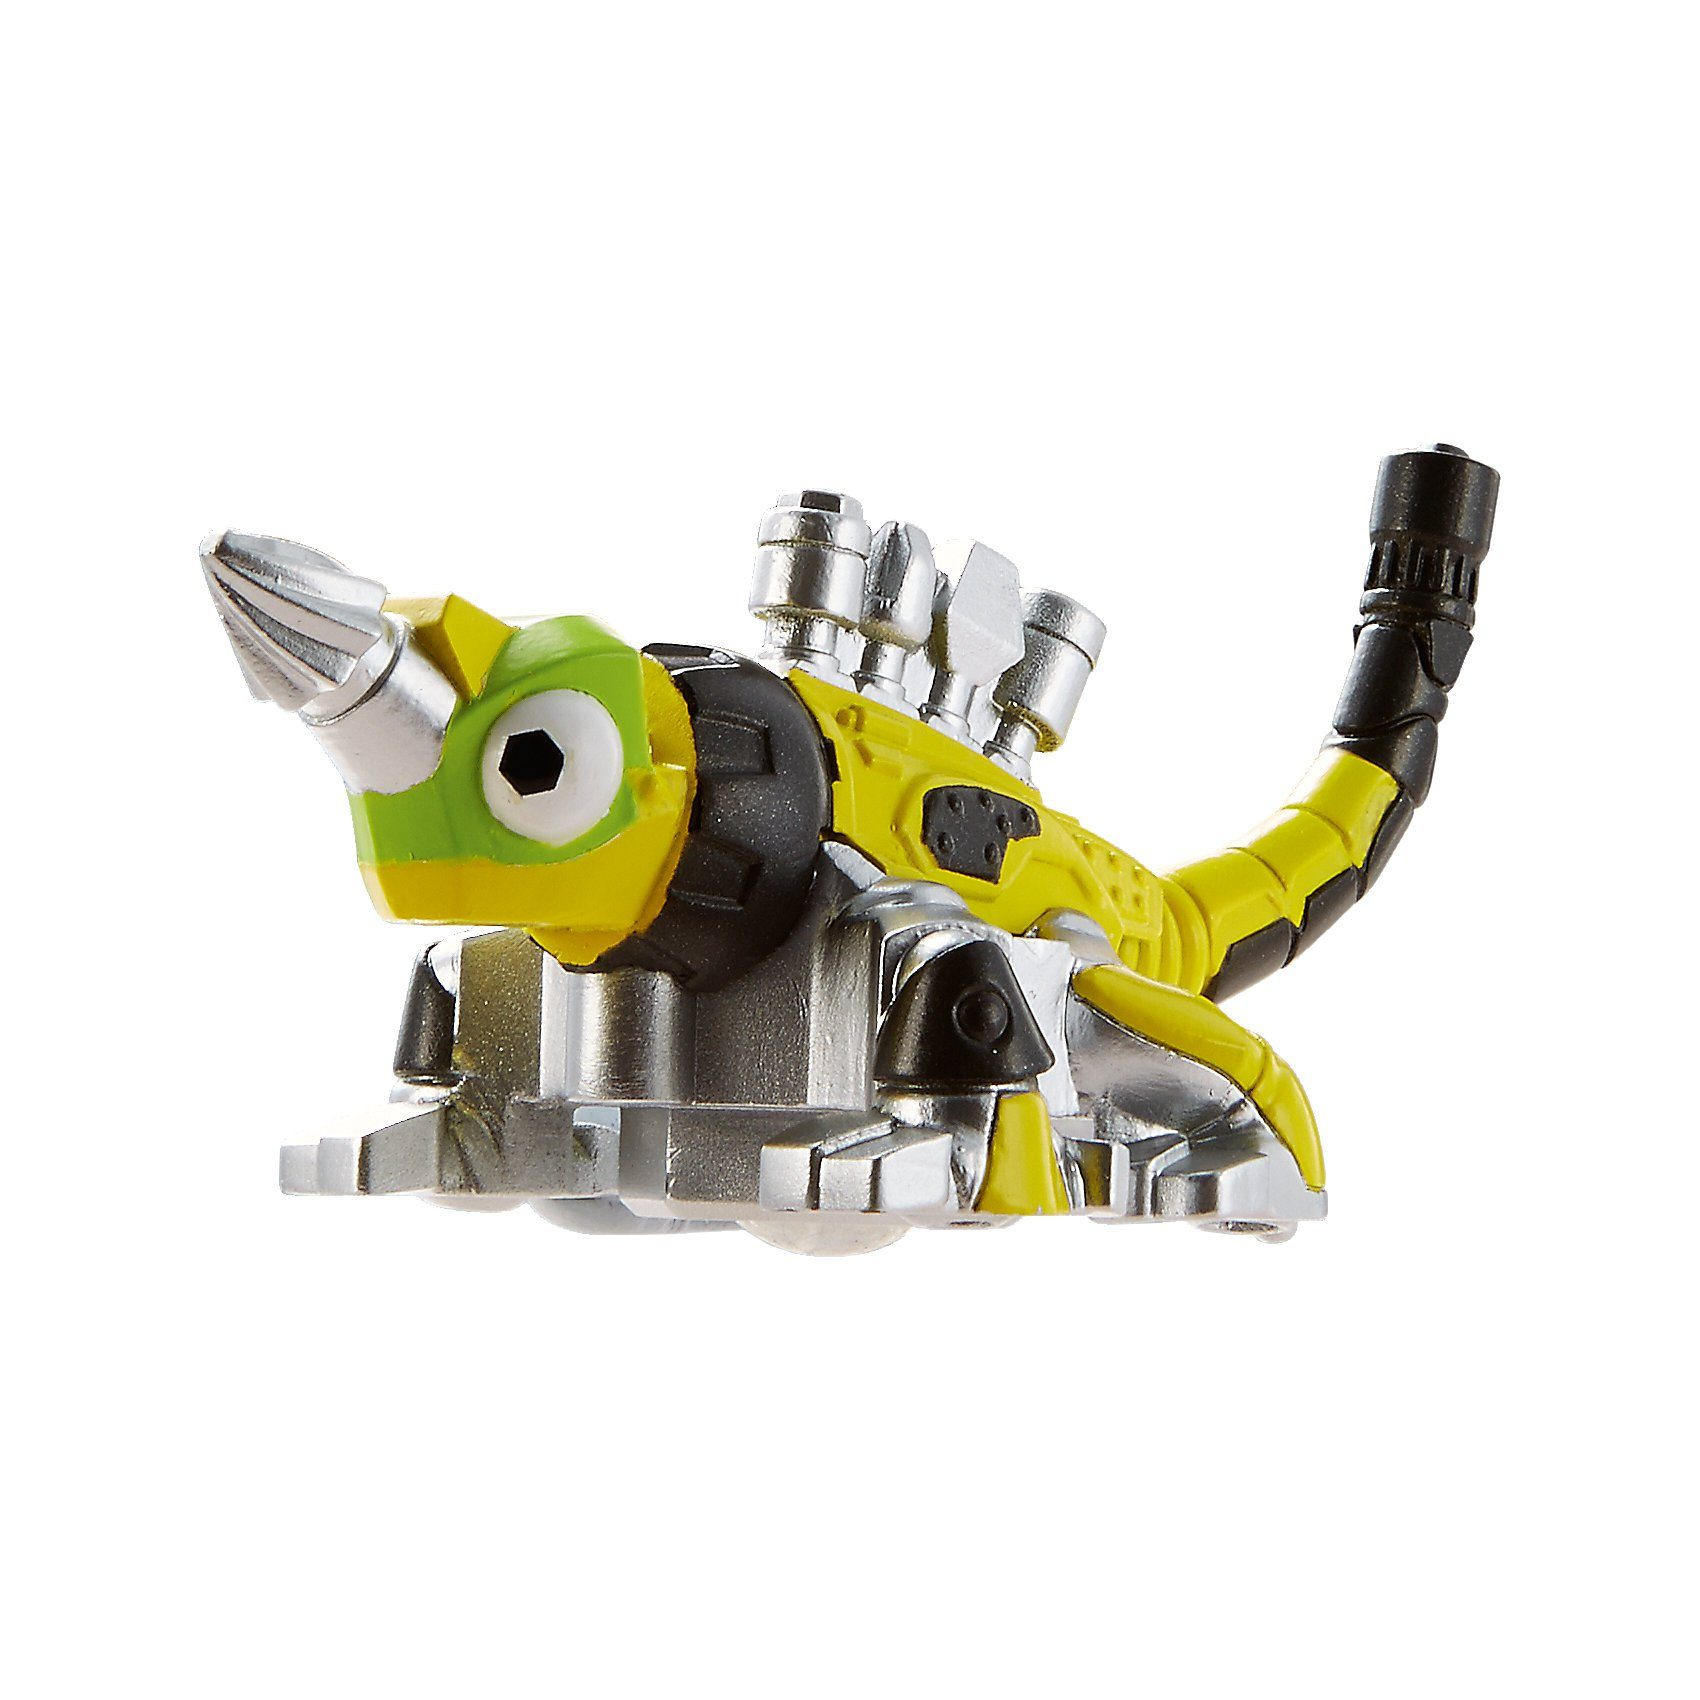 Mattel® Dinotrux Die-Cast-Fahrzeuge Sortiment (rollierend)